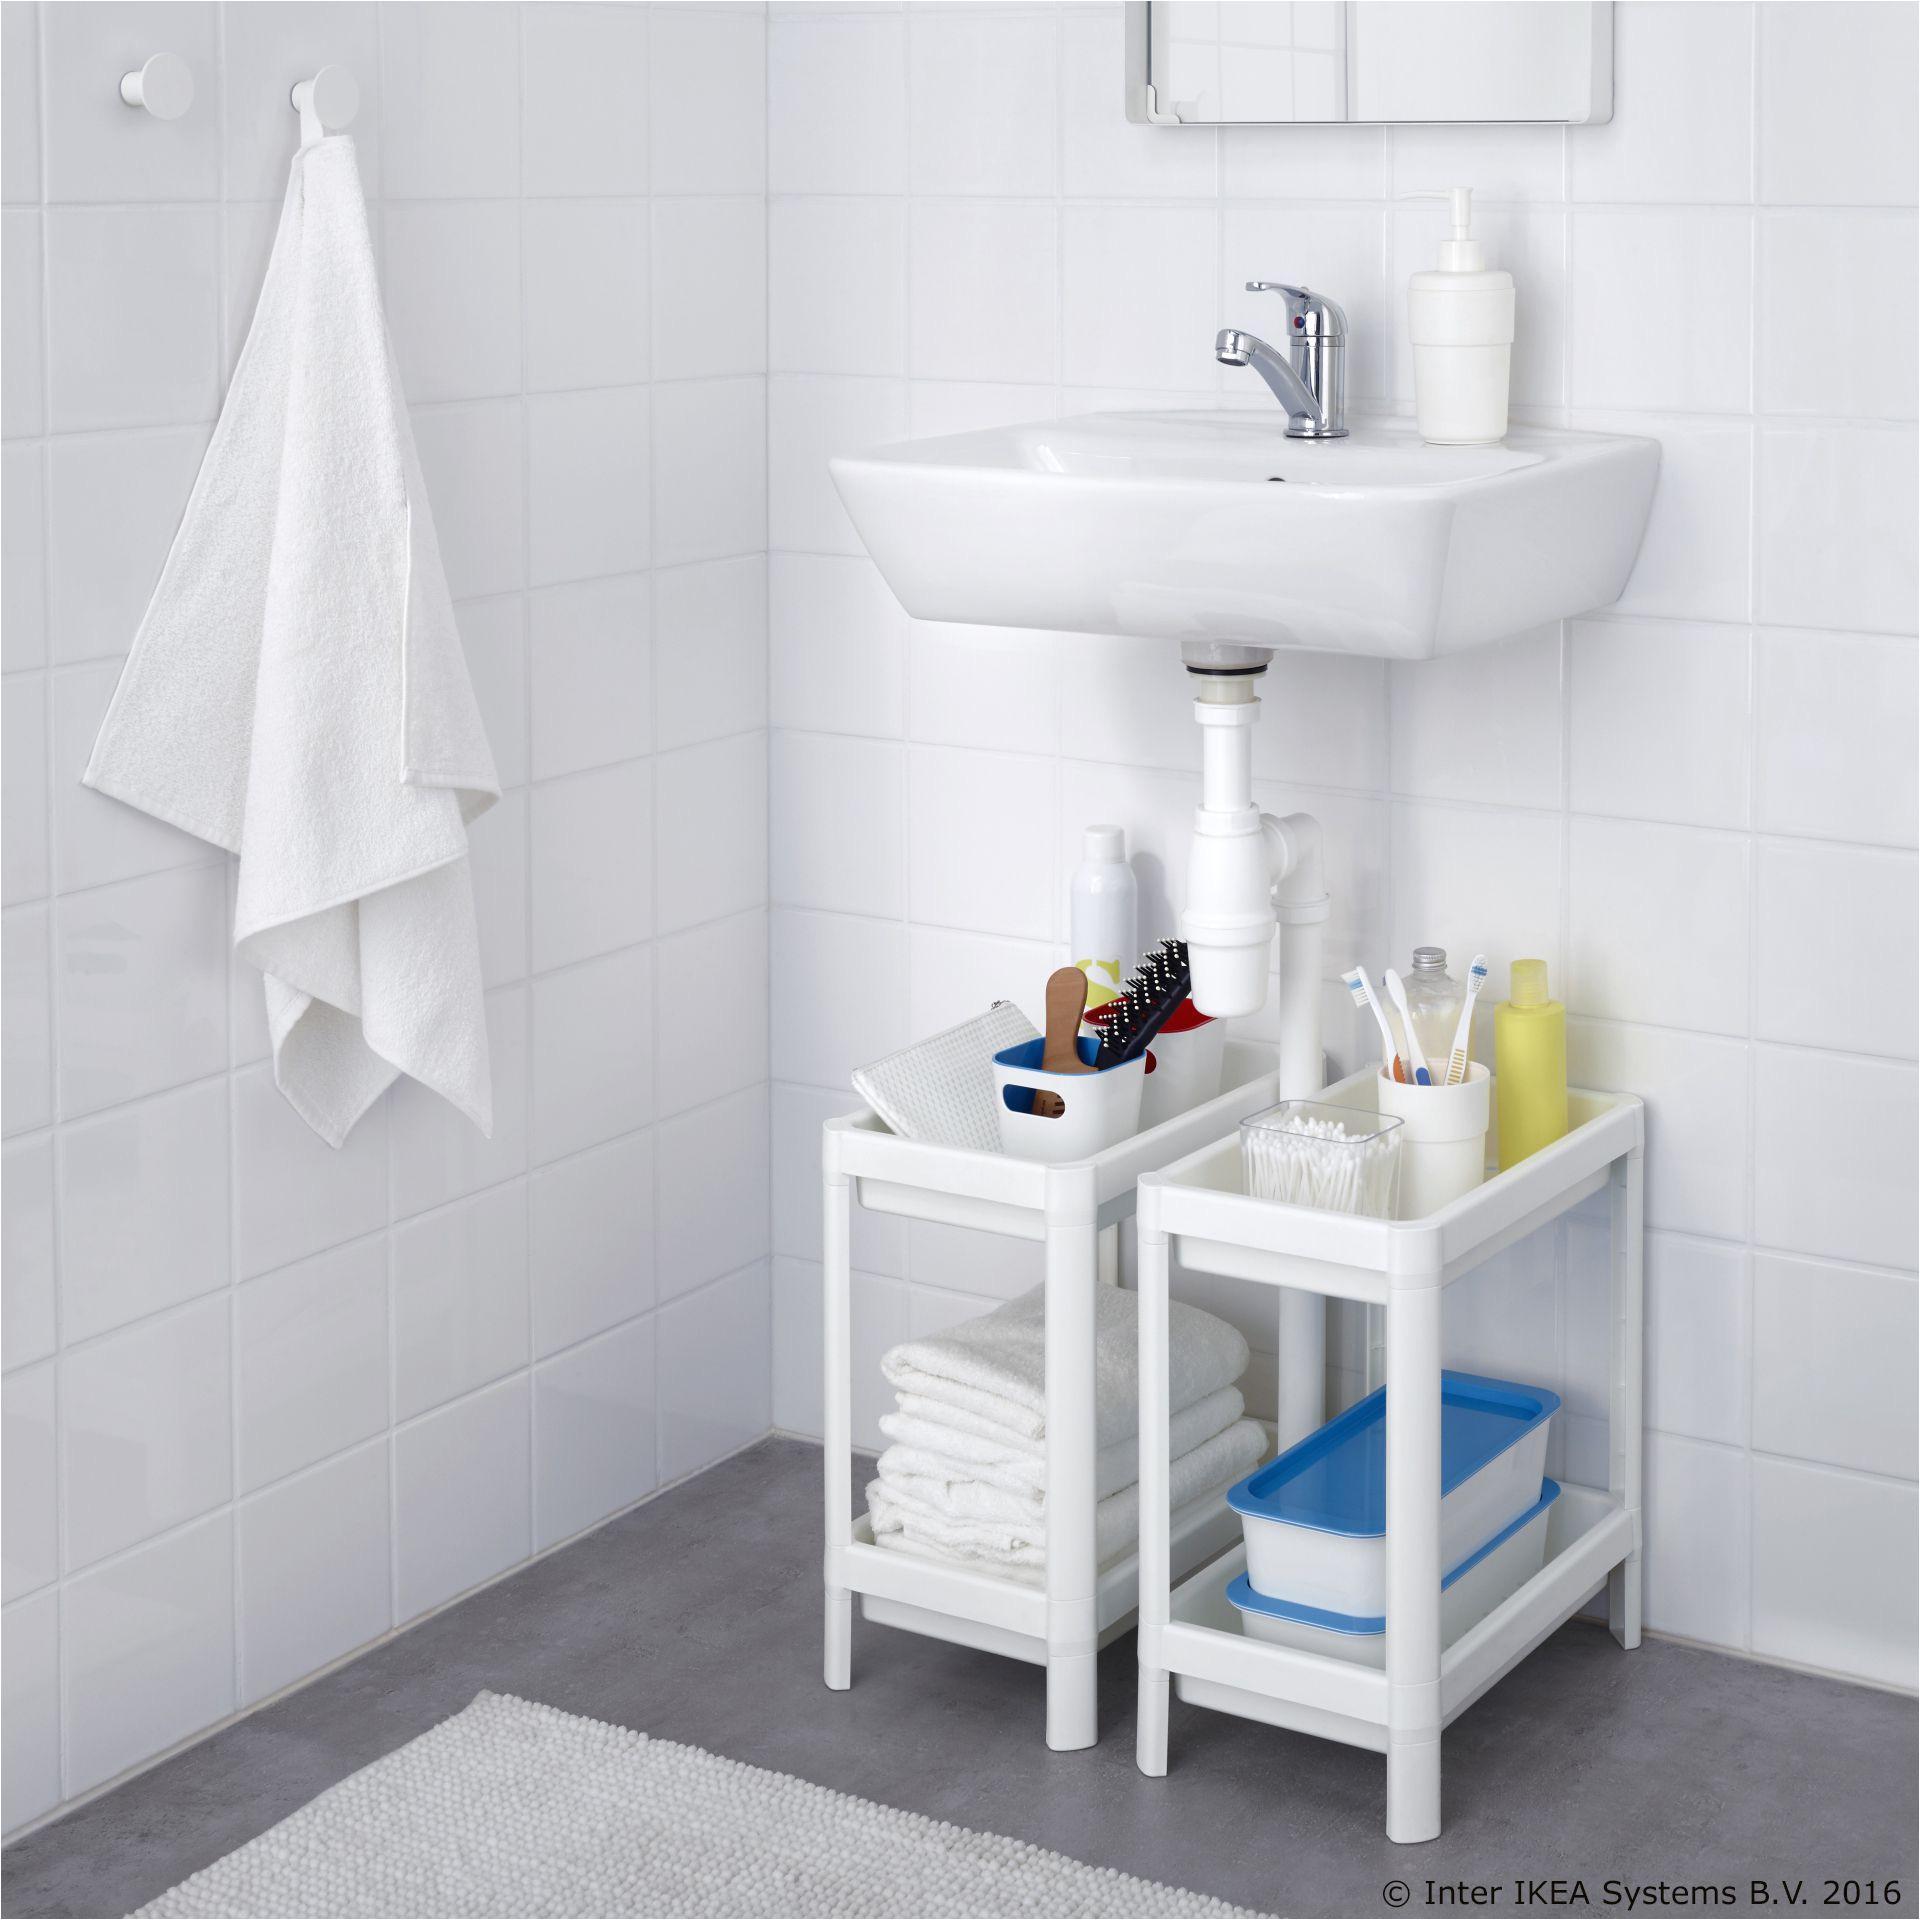 Tri Fold Mirror Ikea Vesken Regal Bijela Kupaonica Pinterest Bathroom Ikea and